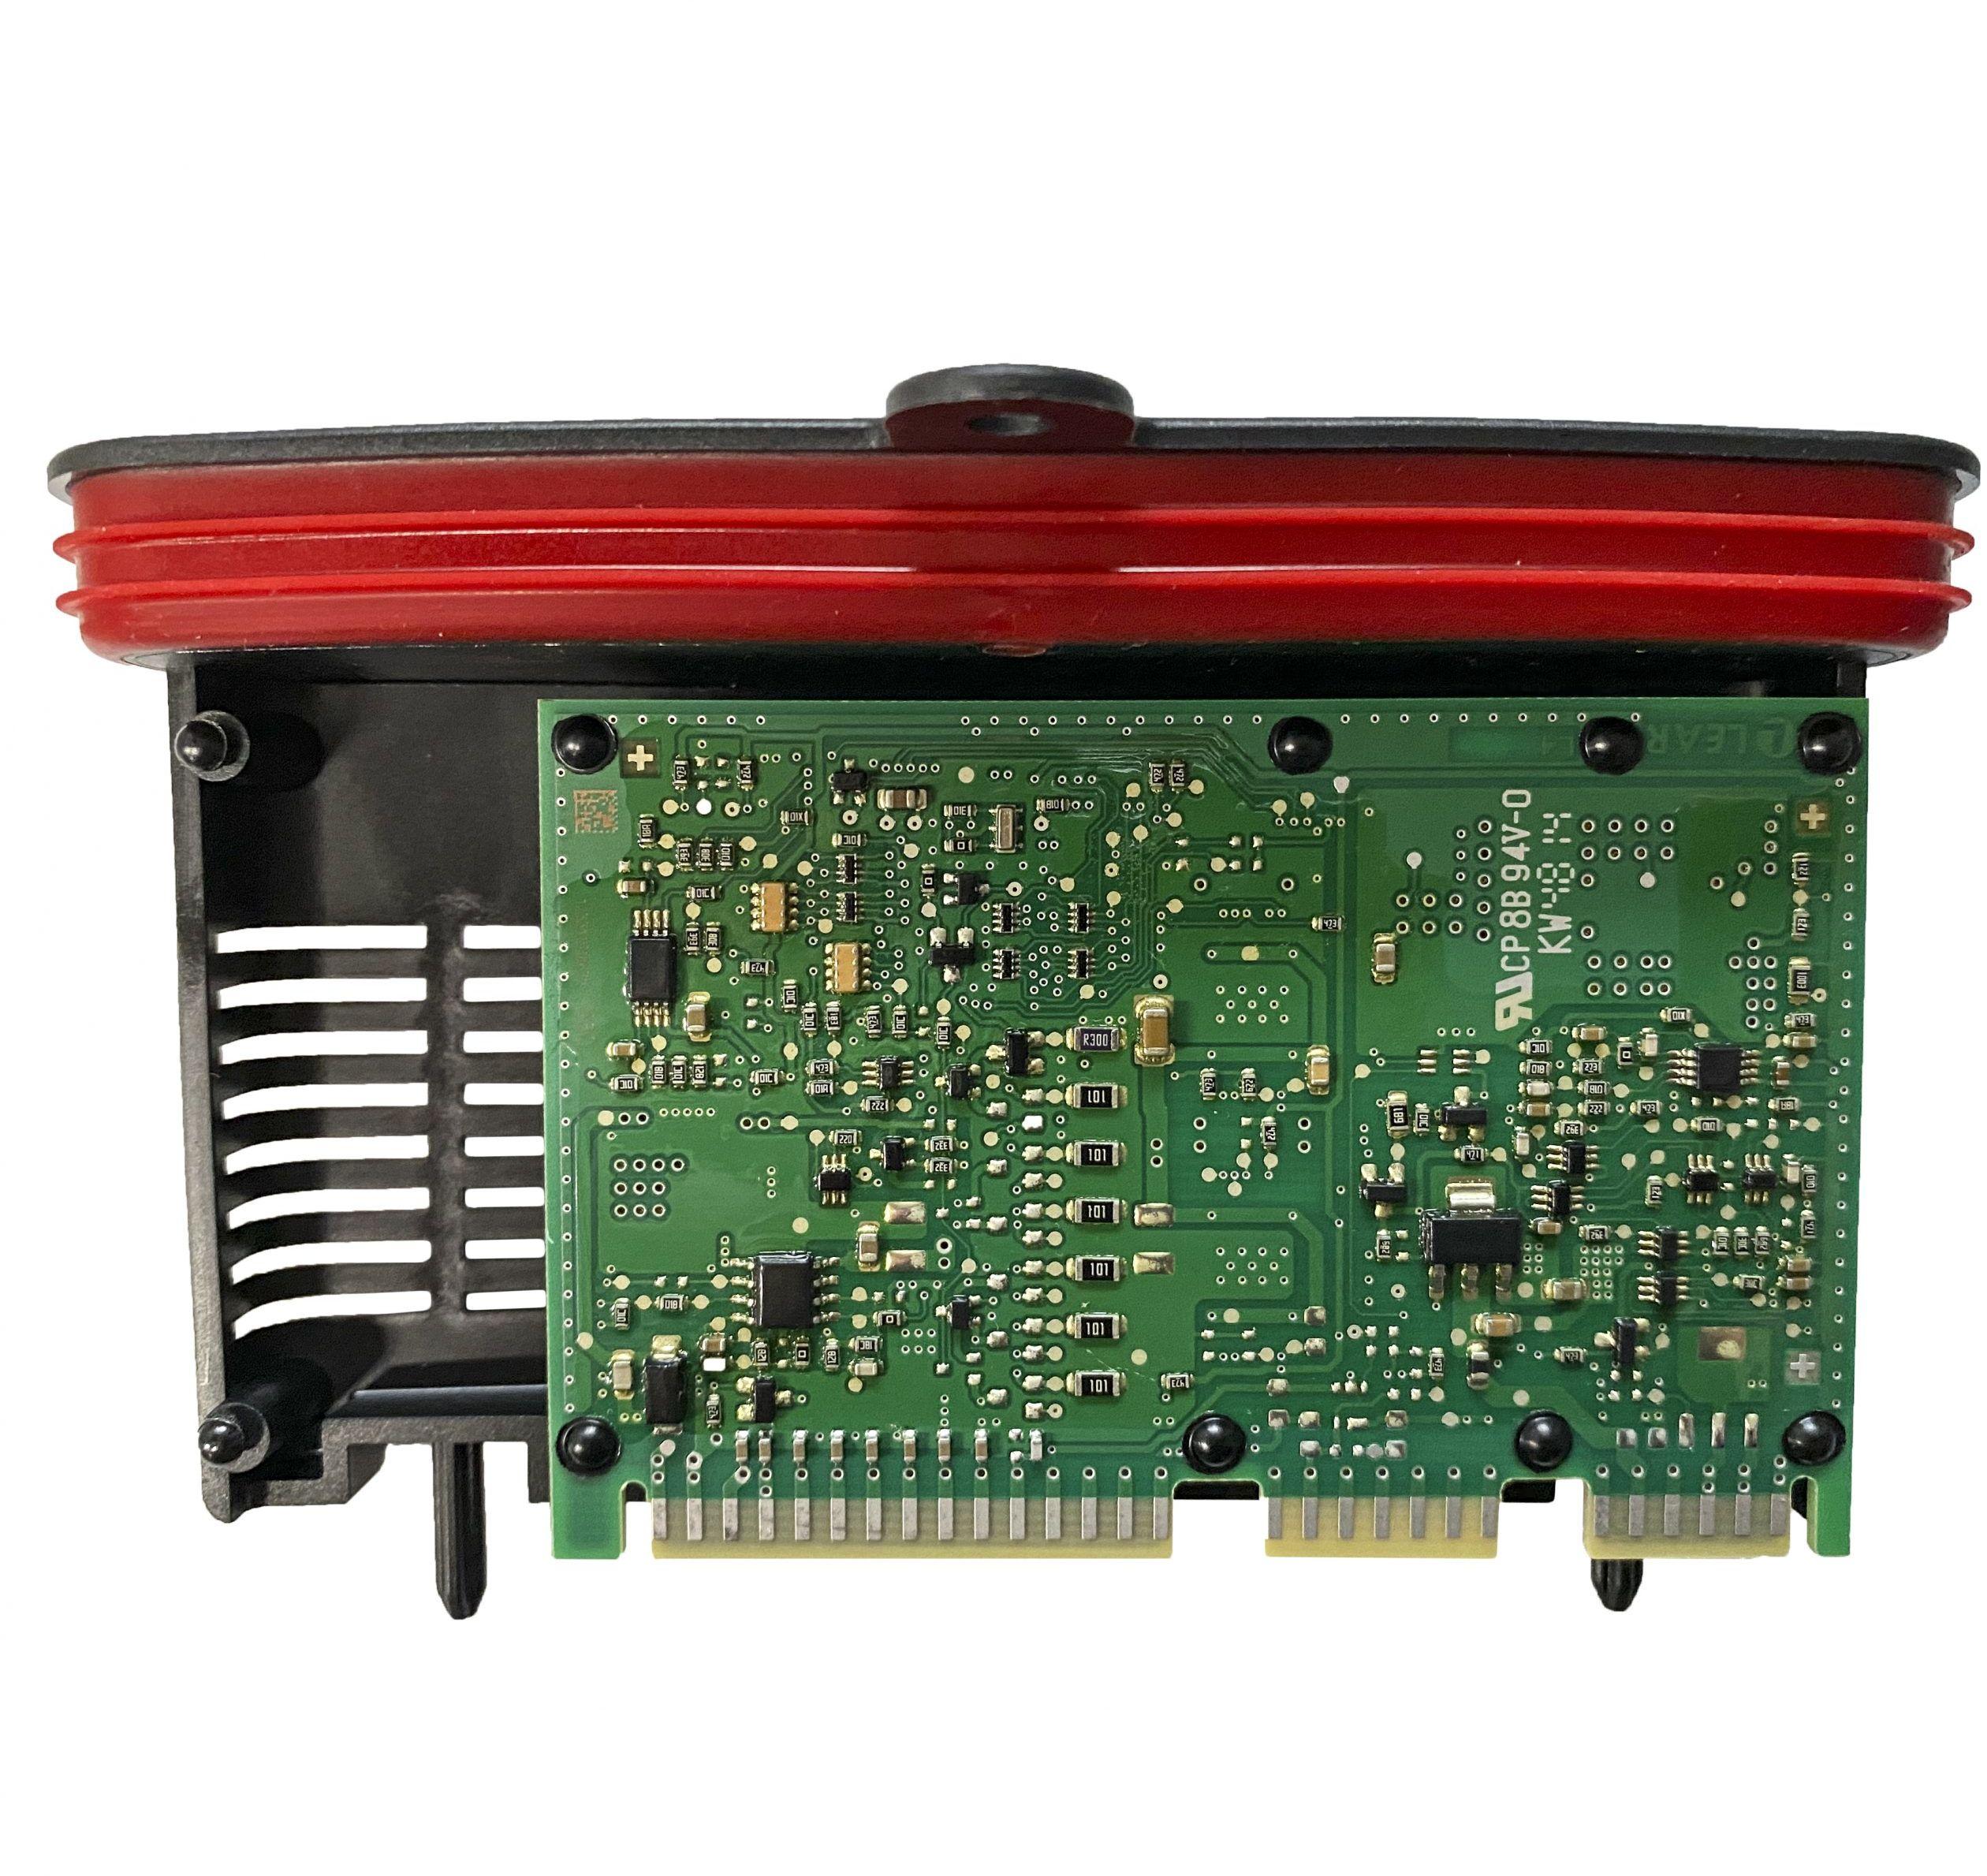 Nowy Oryginalny Moduł Sterownik LED Diód TMS Bmw 5 F10 F11 LCI Facelift F15 X5 F32 F33 4 F80 7316187